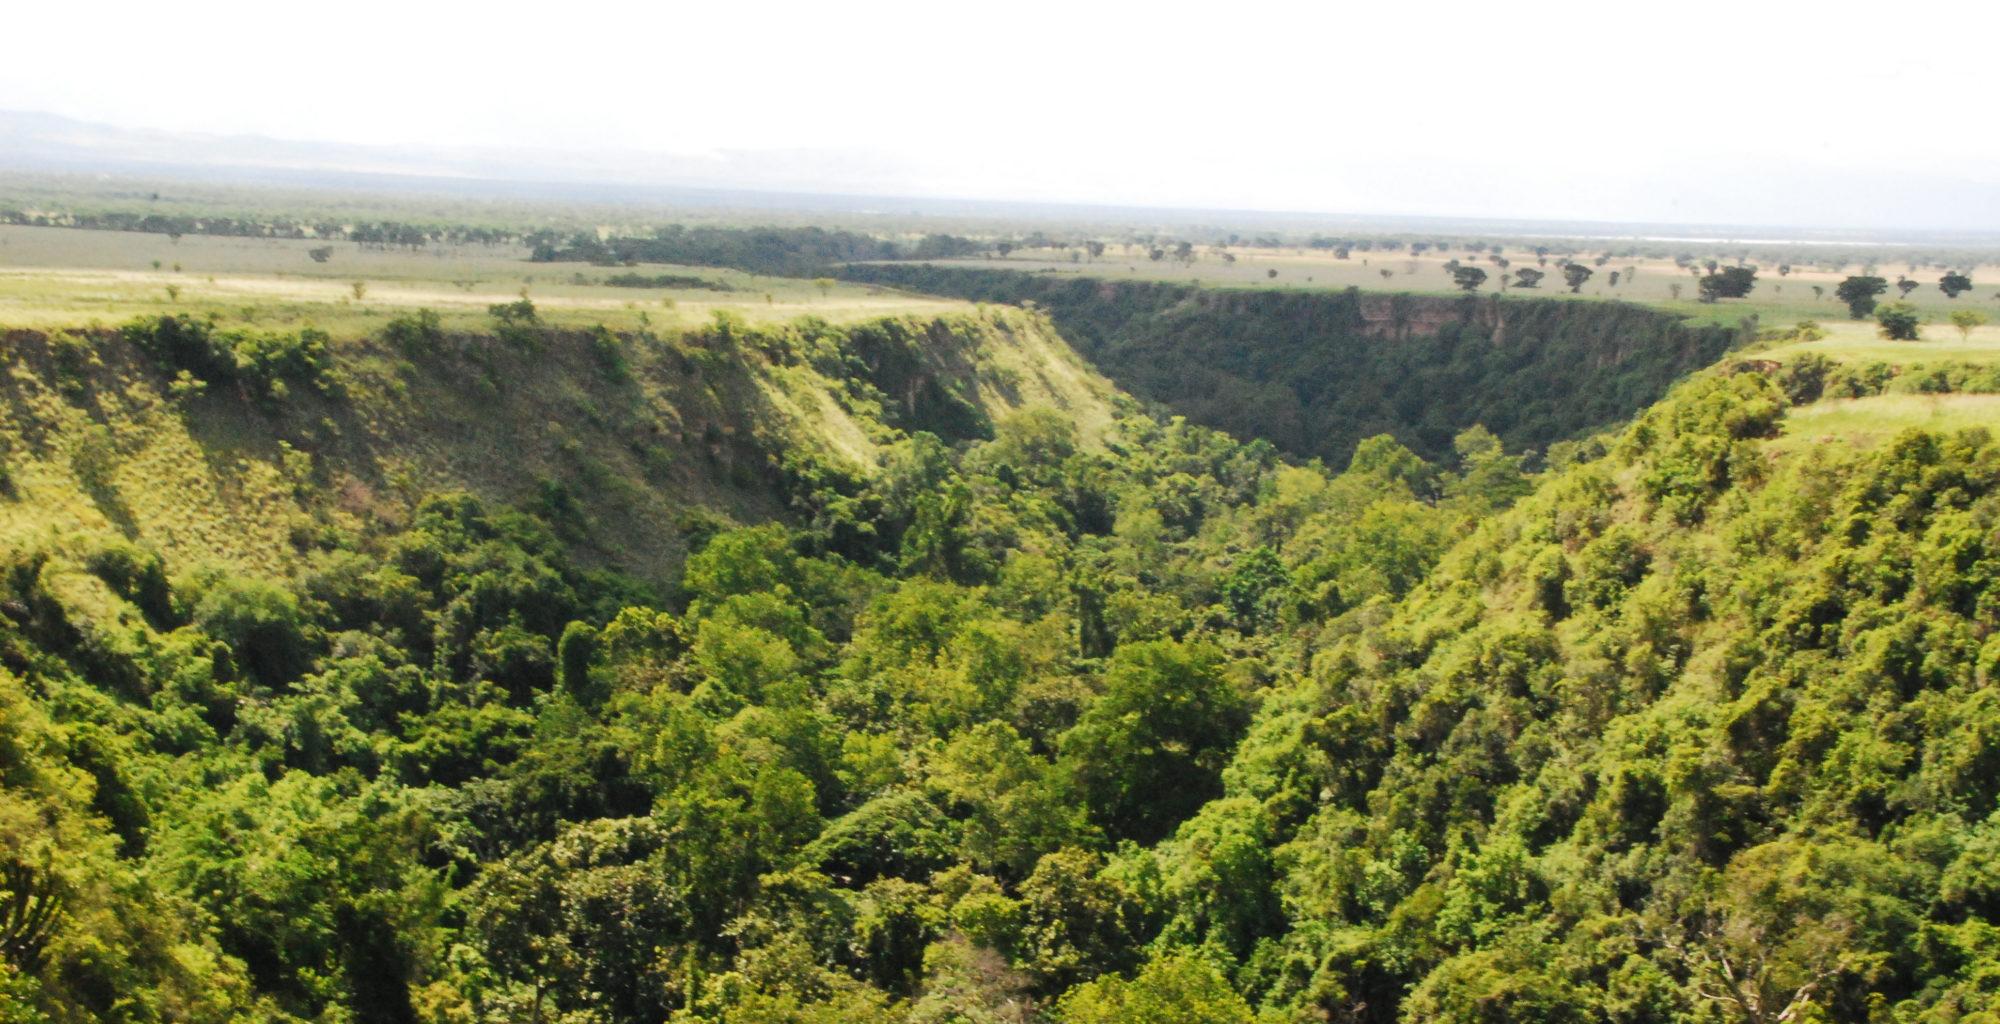 Queen Elizabeth Uganda Forest